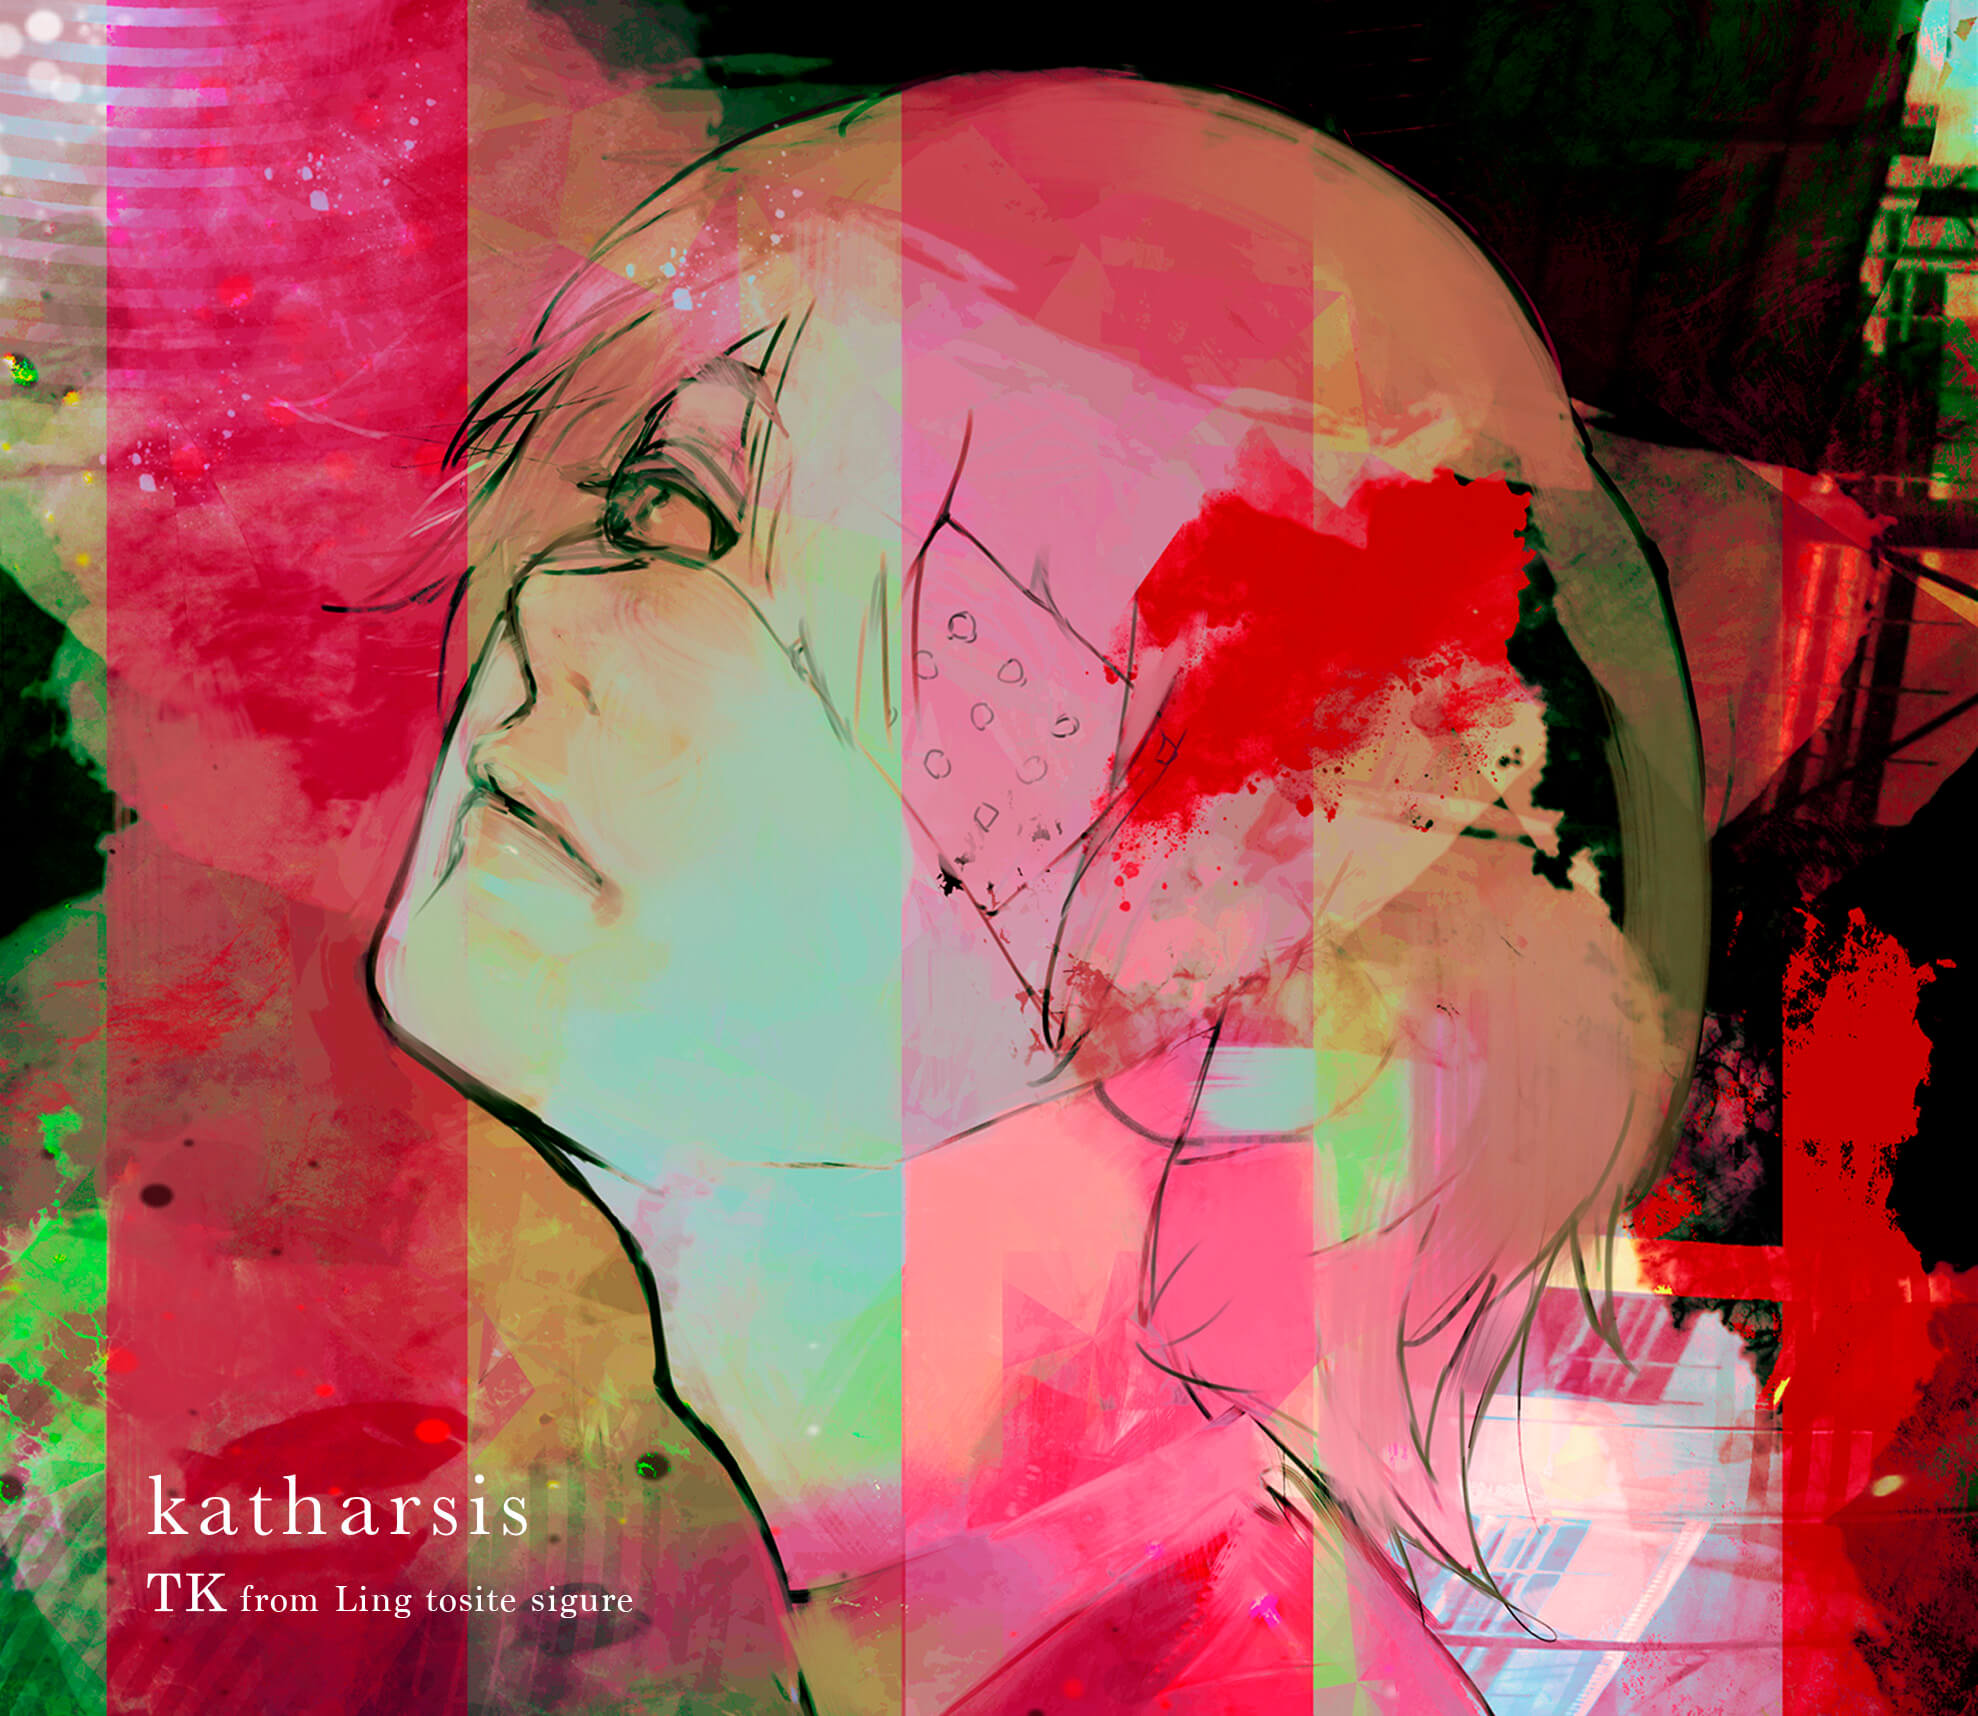 TK from凜冽時雨,新歌「katharsis」的石田翠描繪的插畫公開 TK from凜冽時雨、東京喰種、